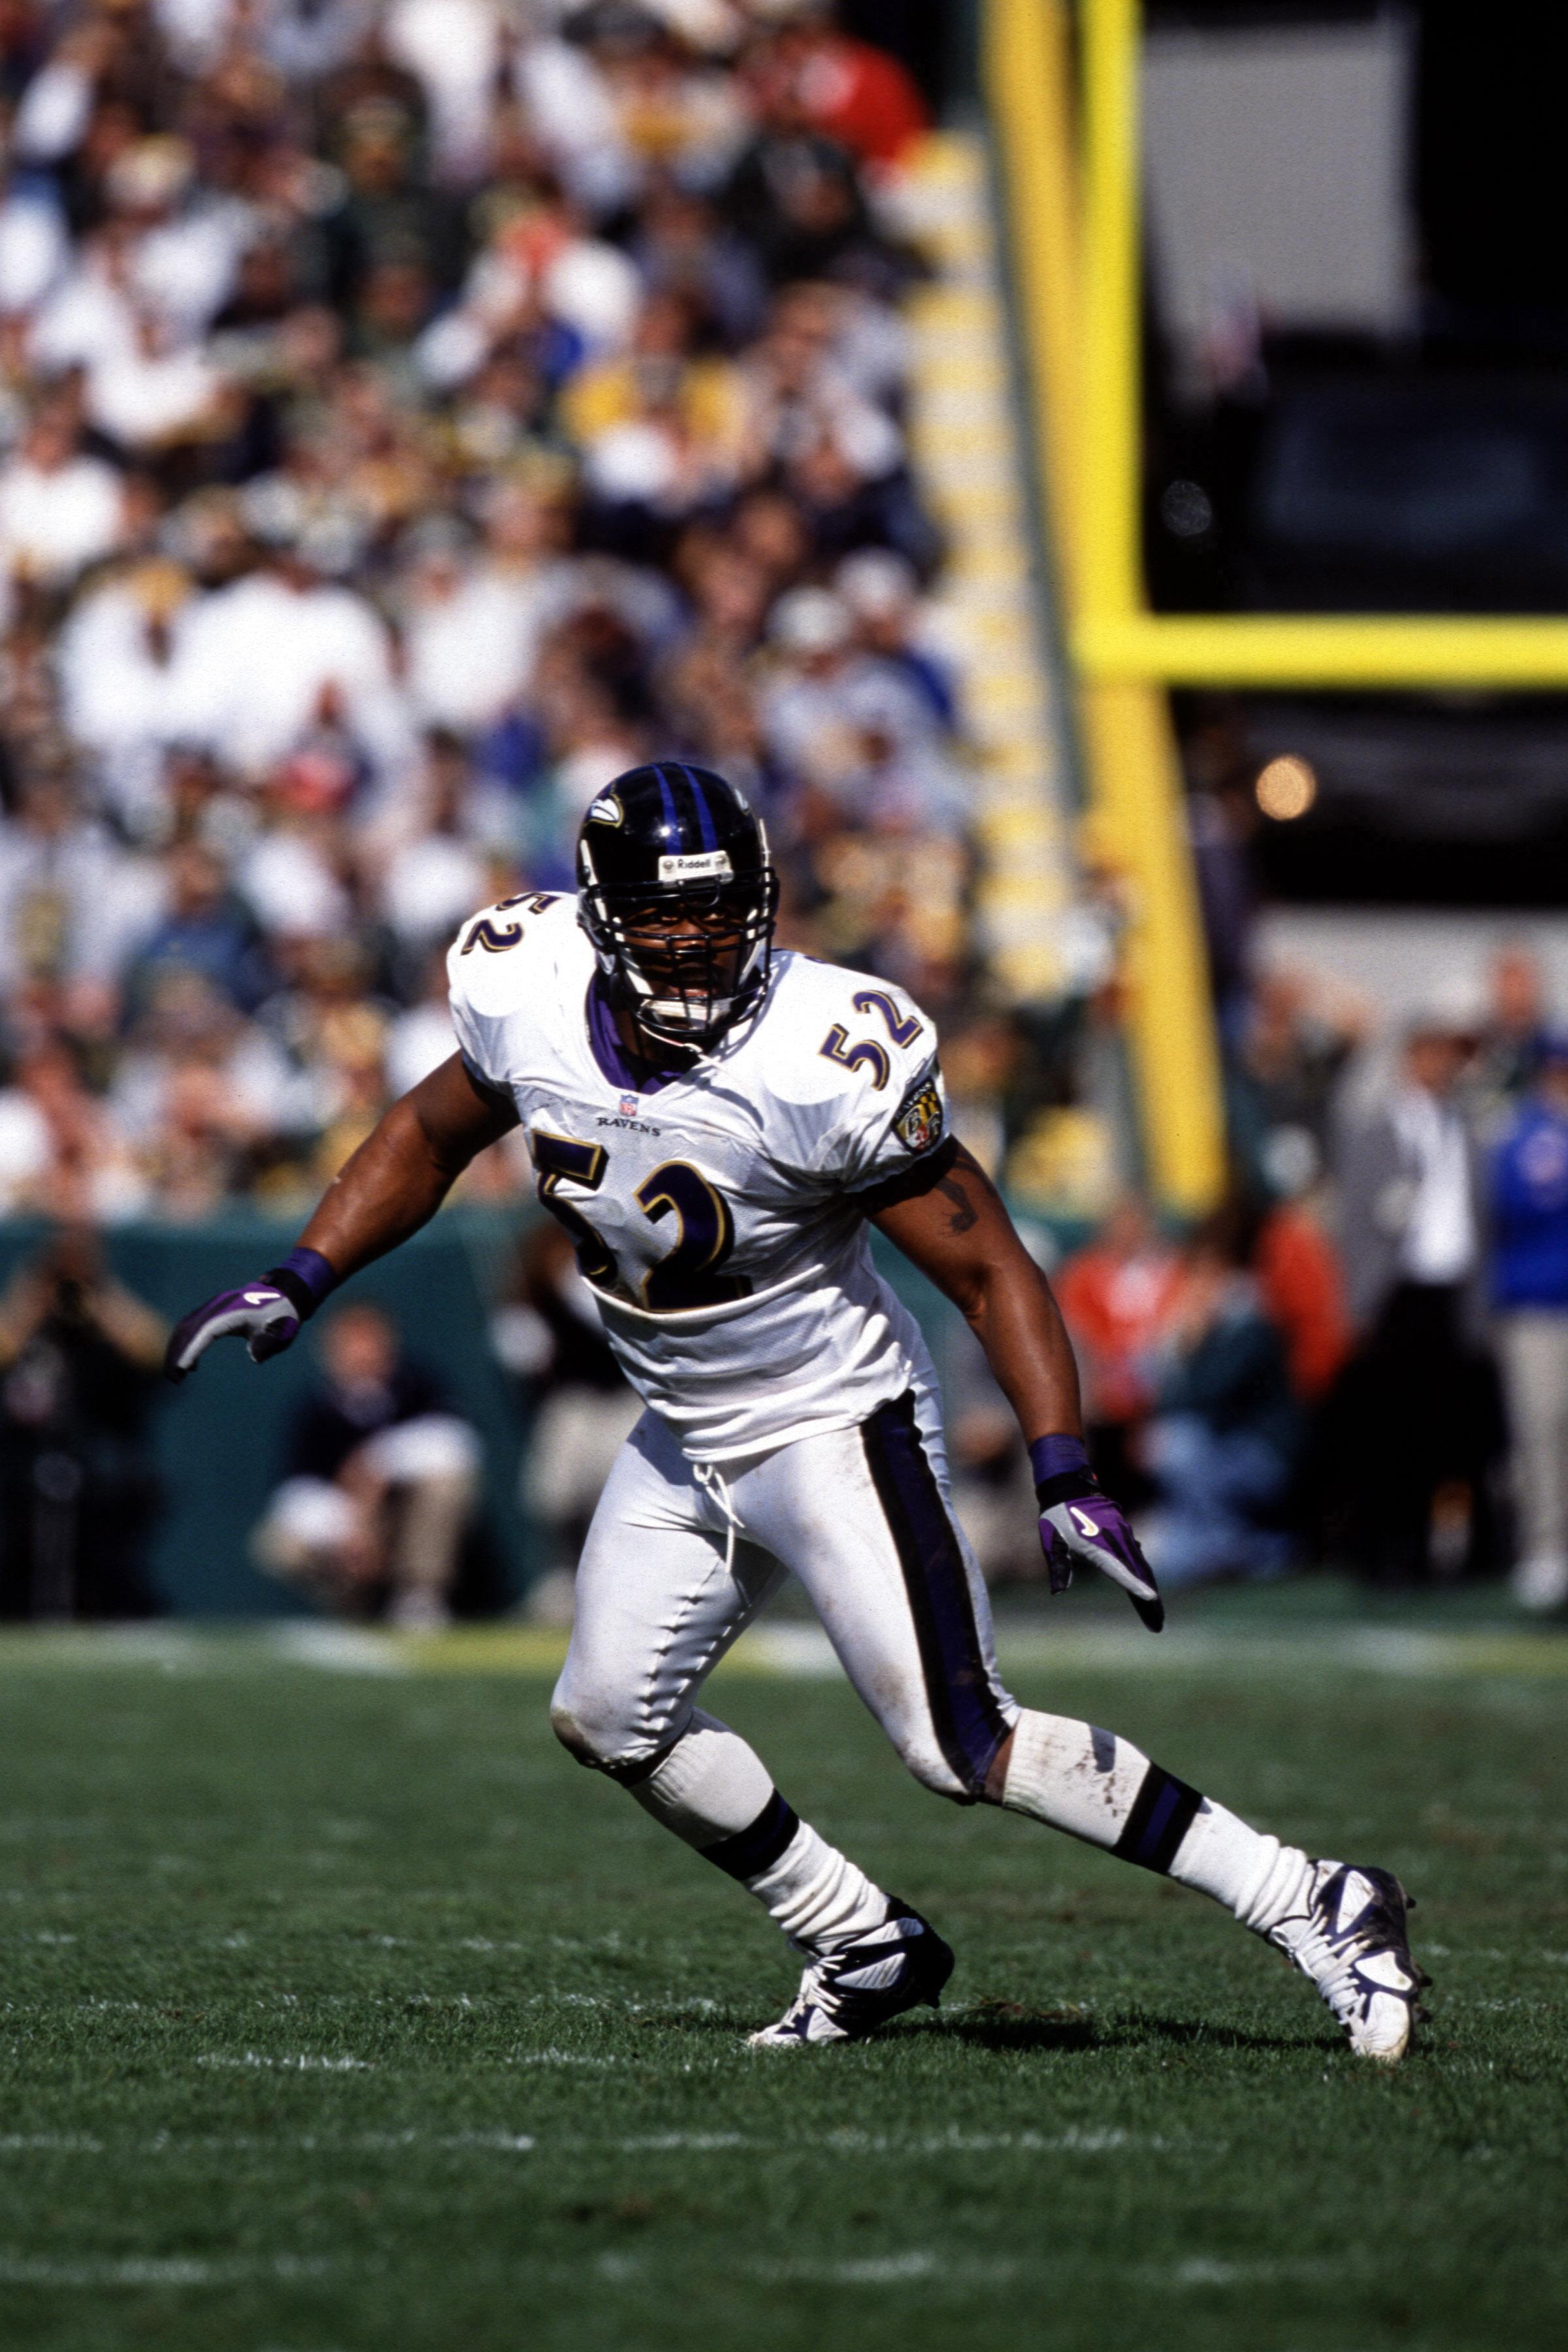 Baltimore Ravens vs. Green Bay Packers - October 14, 2001